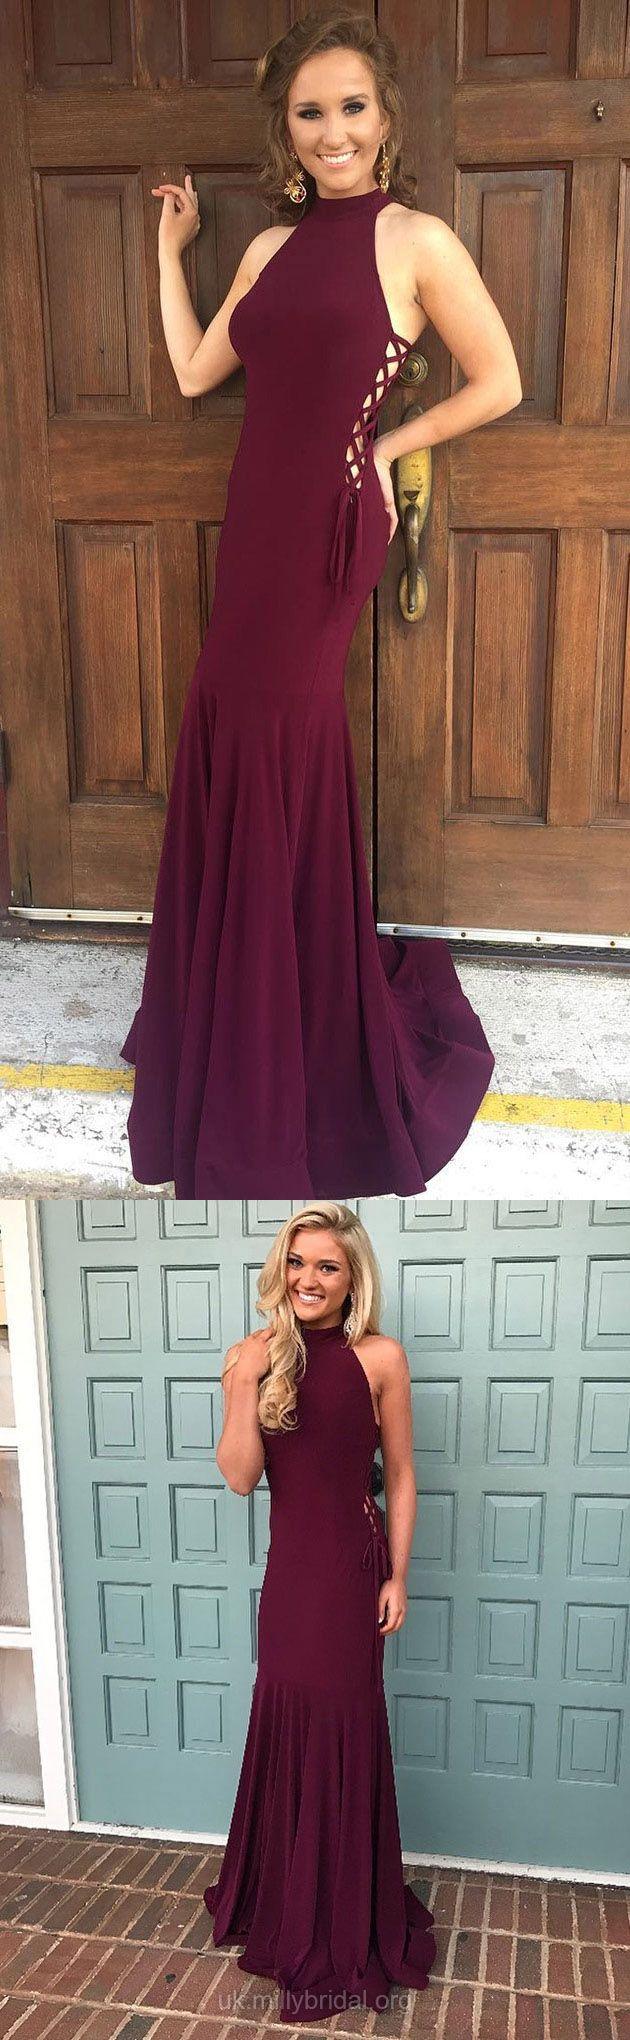 best simple prom dresses images on pinterest